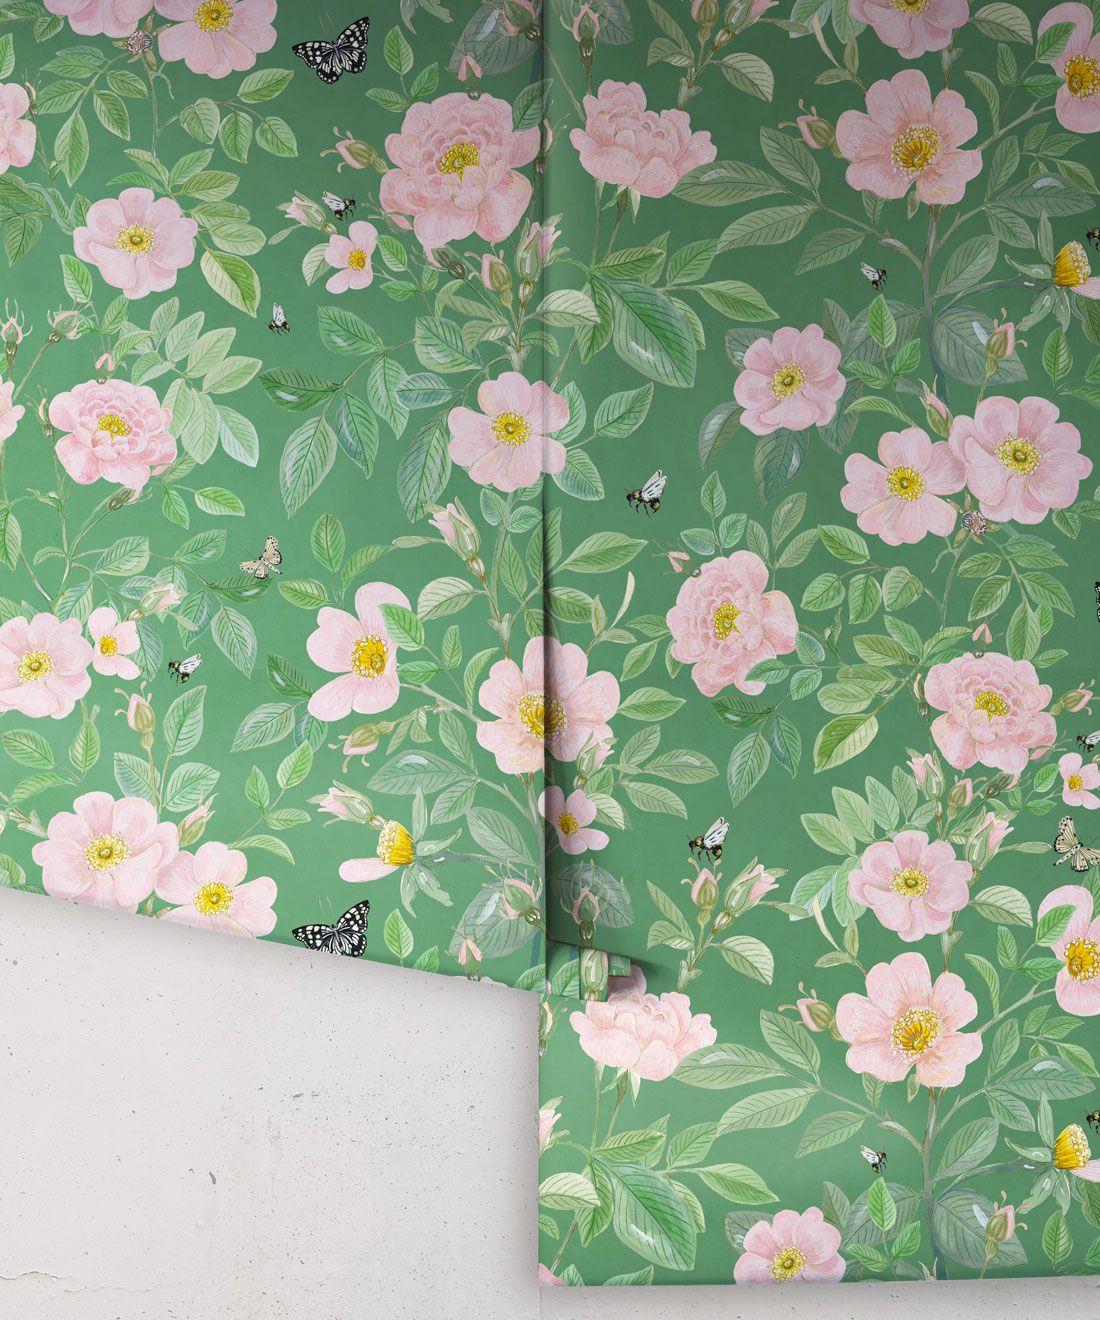 Rosa Wallpaper • Floral Wallpaper •Forest Green •Rolls